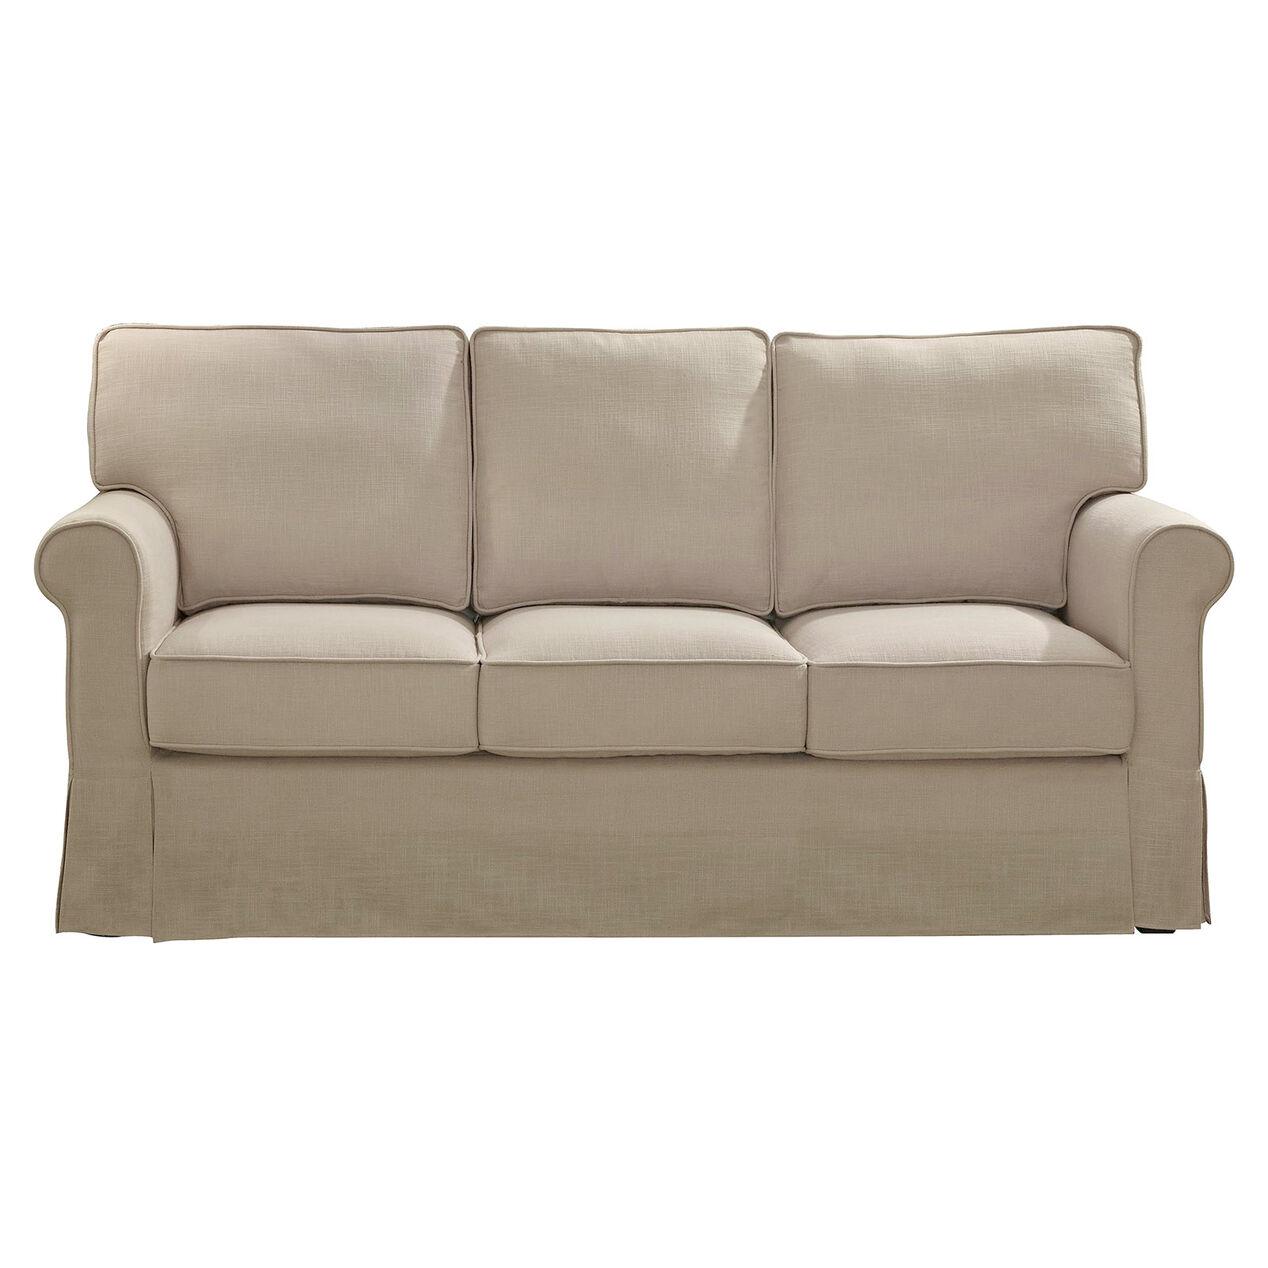 savannah natural linen sofa with faux slip cover at home